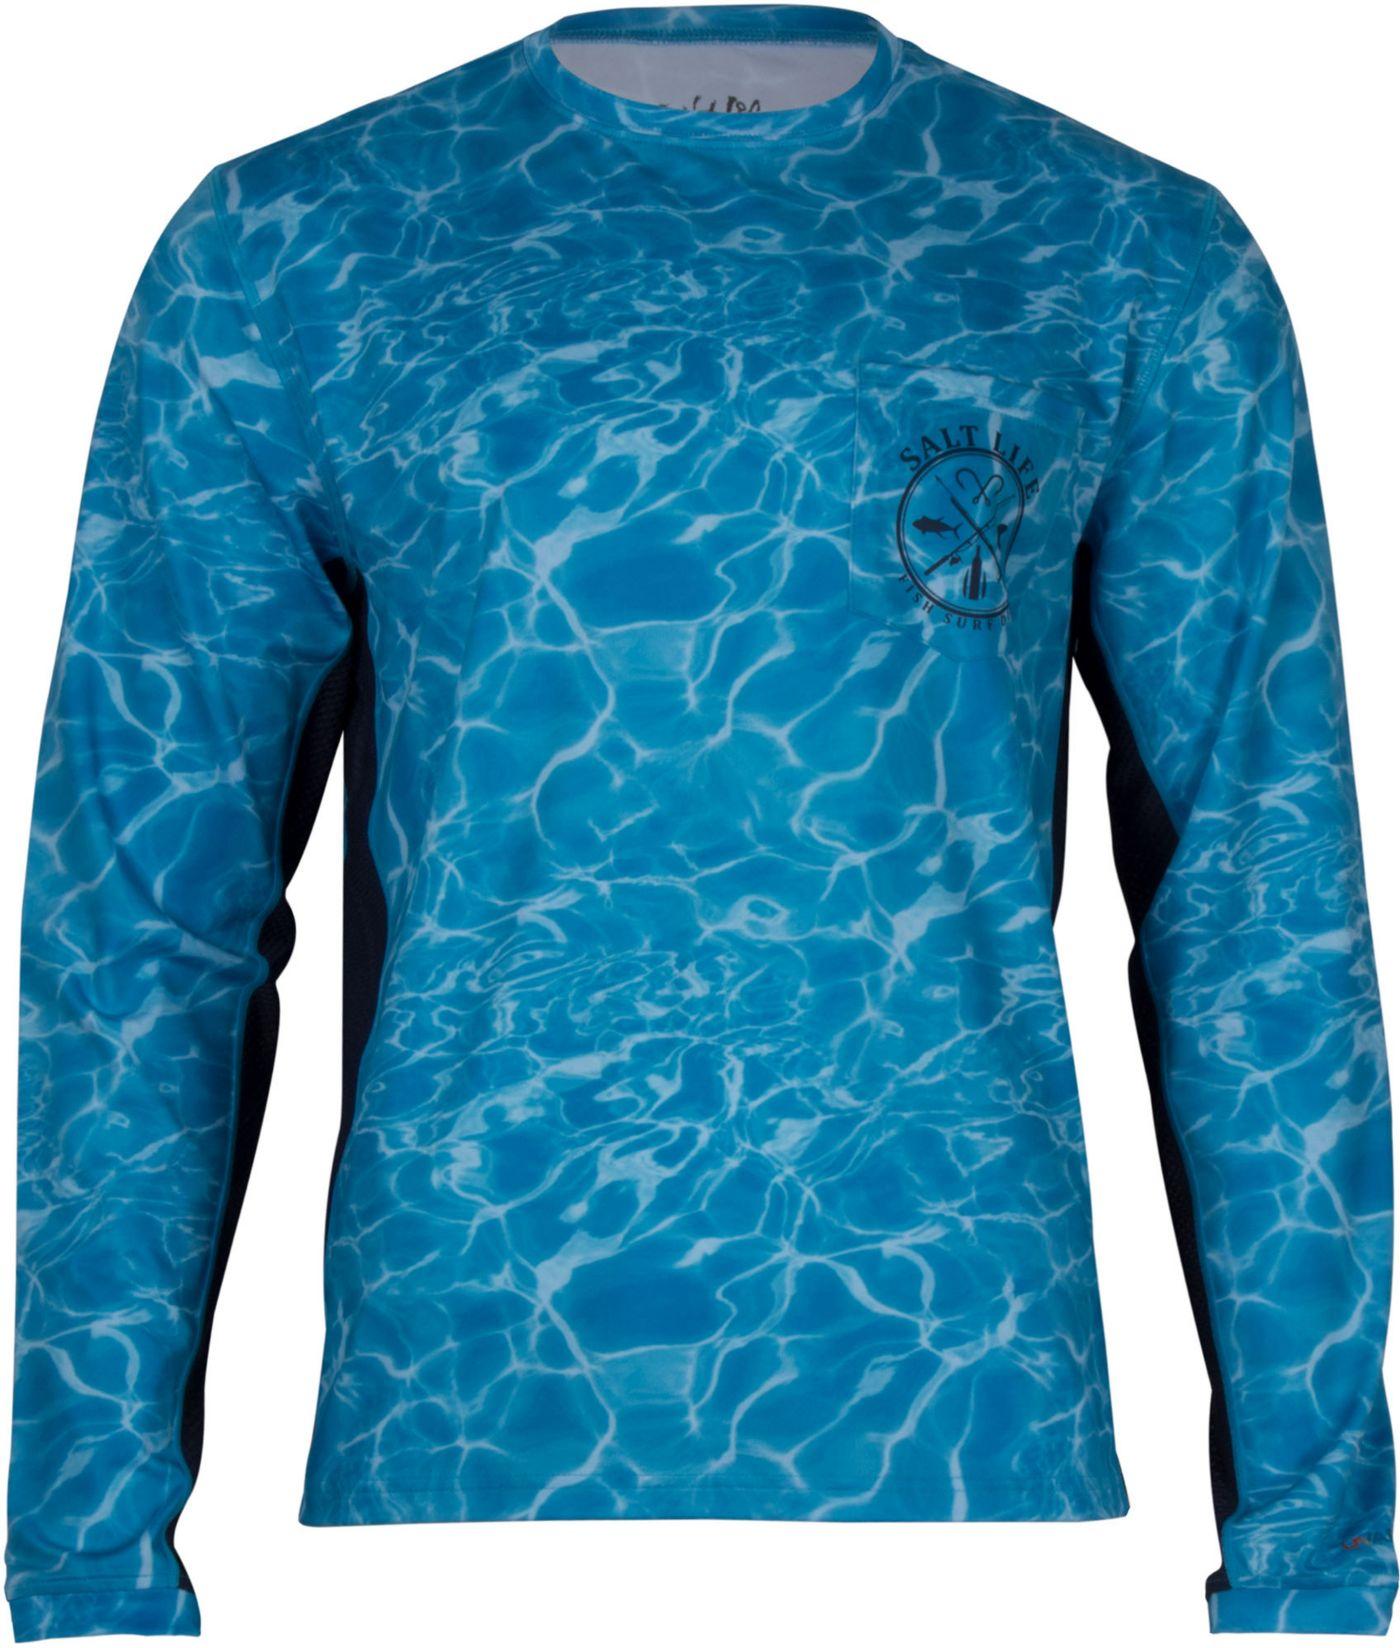 Salt Life Men's Calm Waters Performance Long Sleeve Shirt